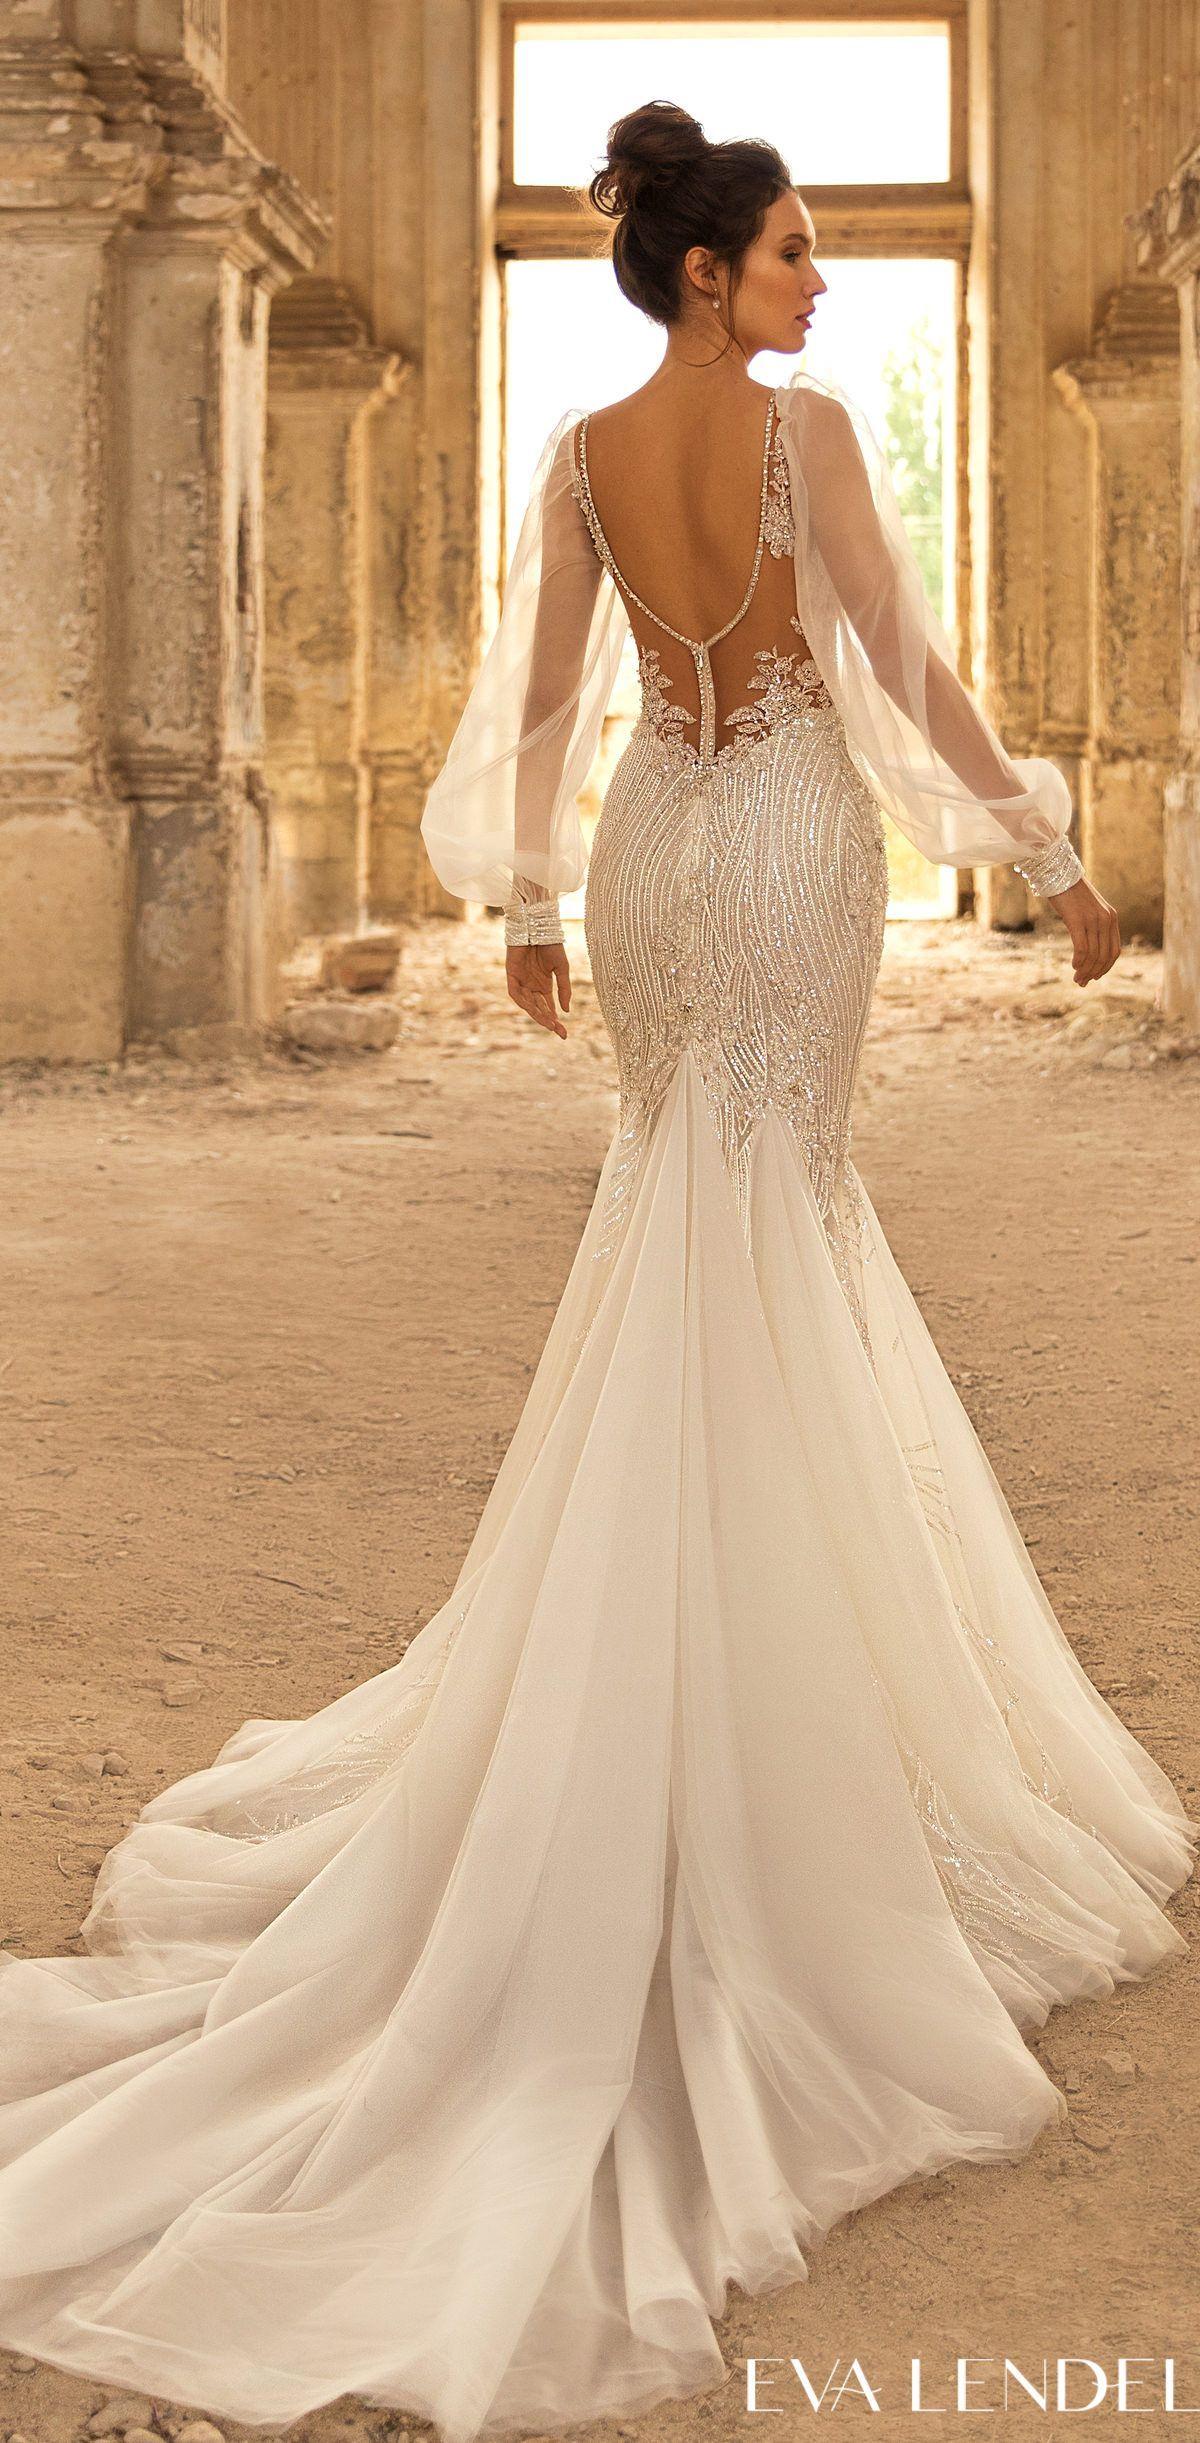 Eva Lendel Wedding Dresses 2021 And 2022 Belle The Magazine In 2021 Dresses Fitted Wedding Dress Mermaid Wedding Dress [ 2443 x 1200 Pixel ]